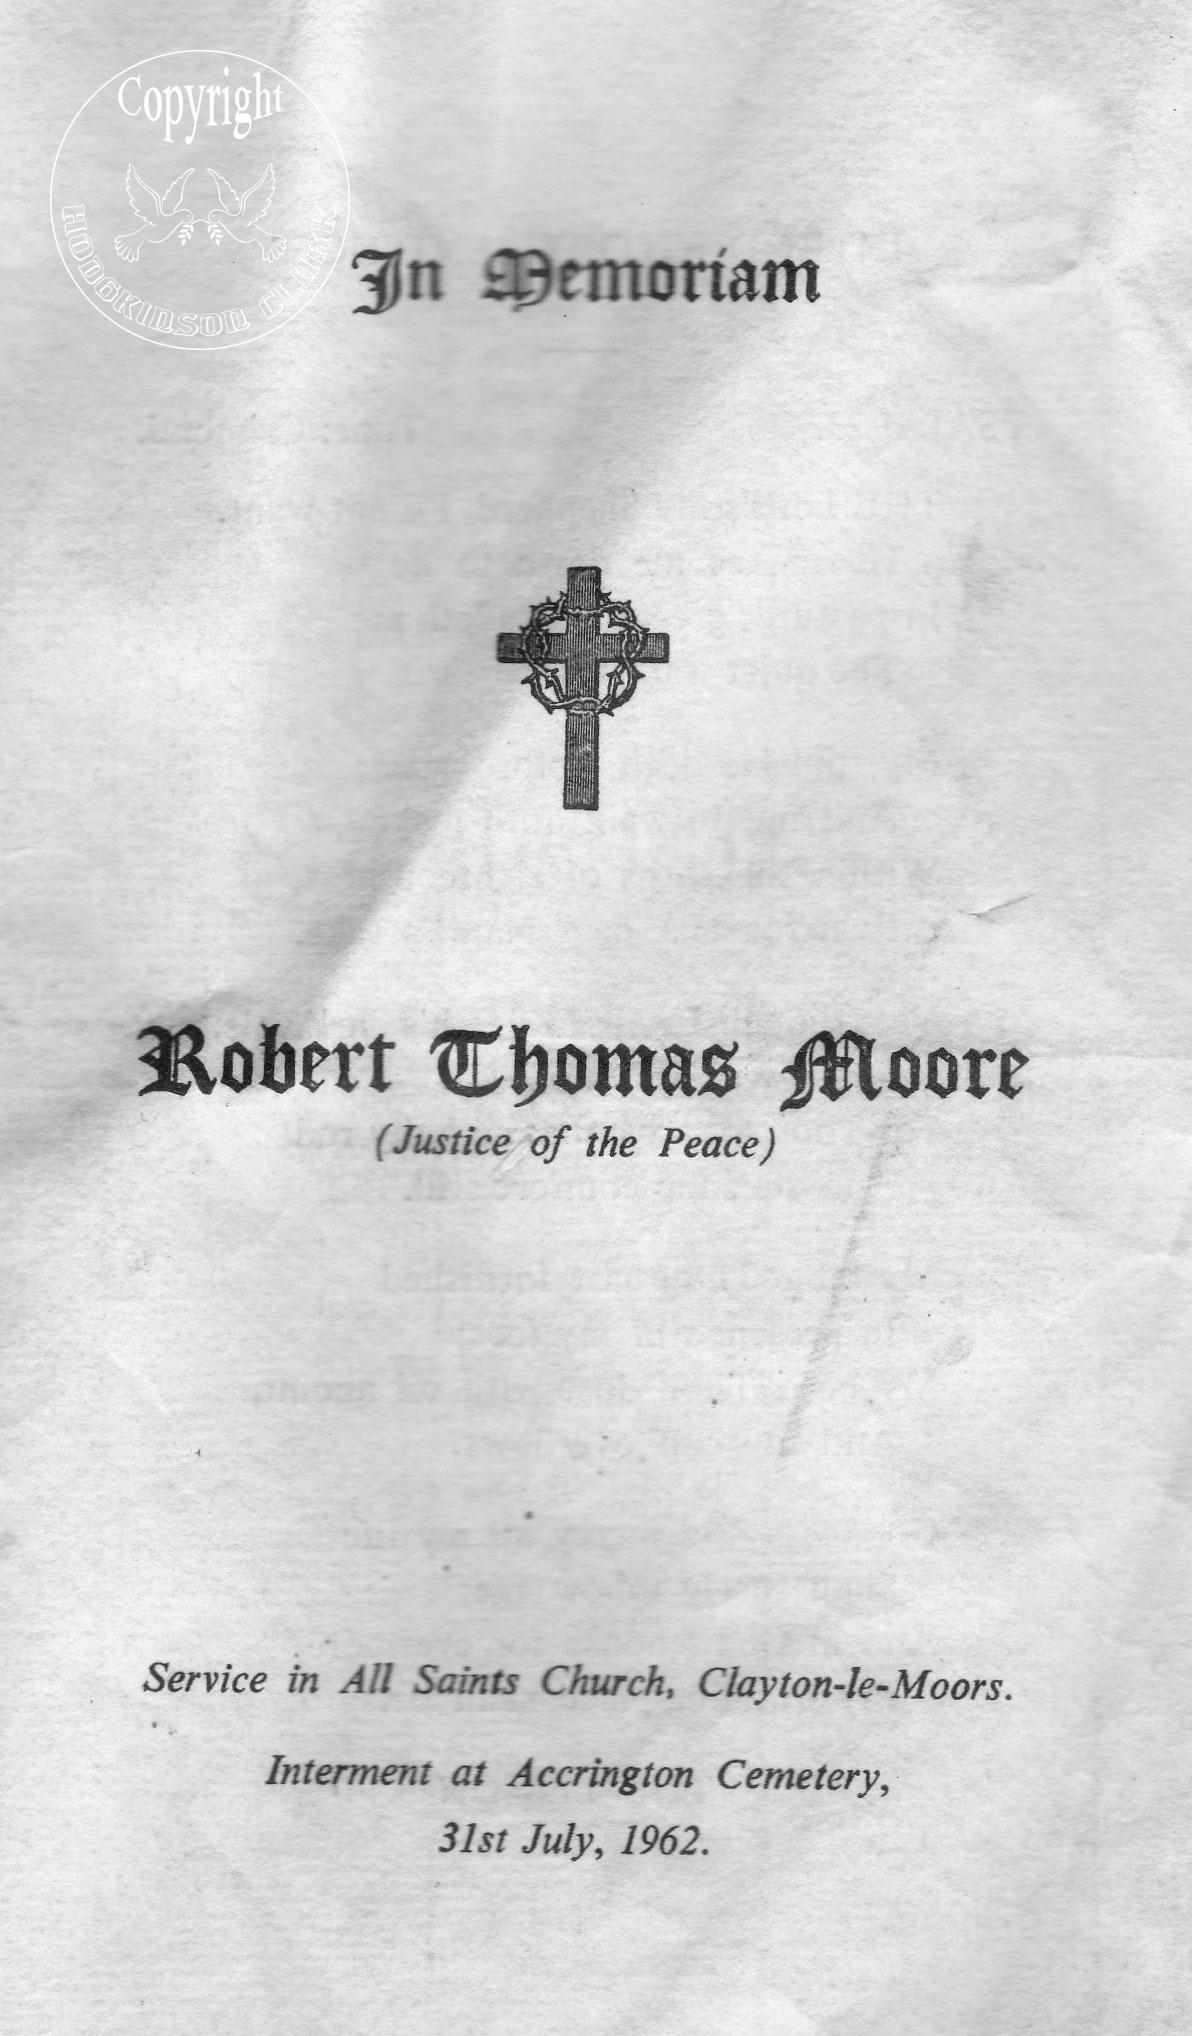 Robert Thomas Moore